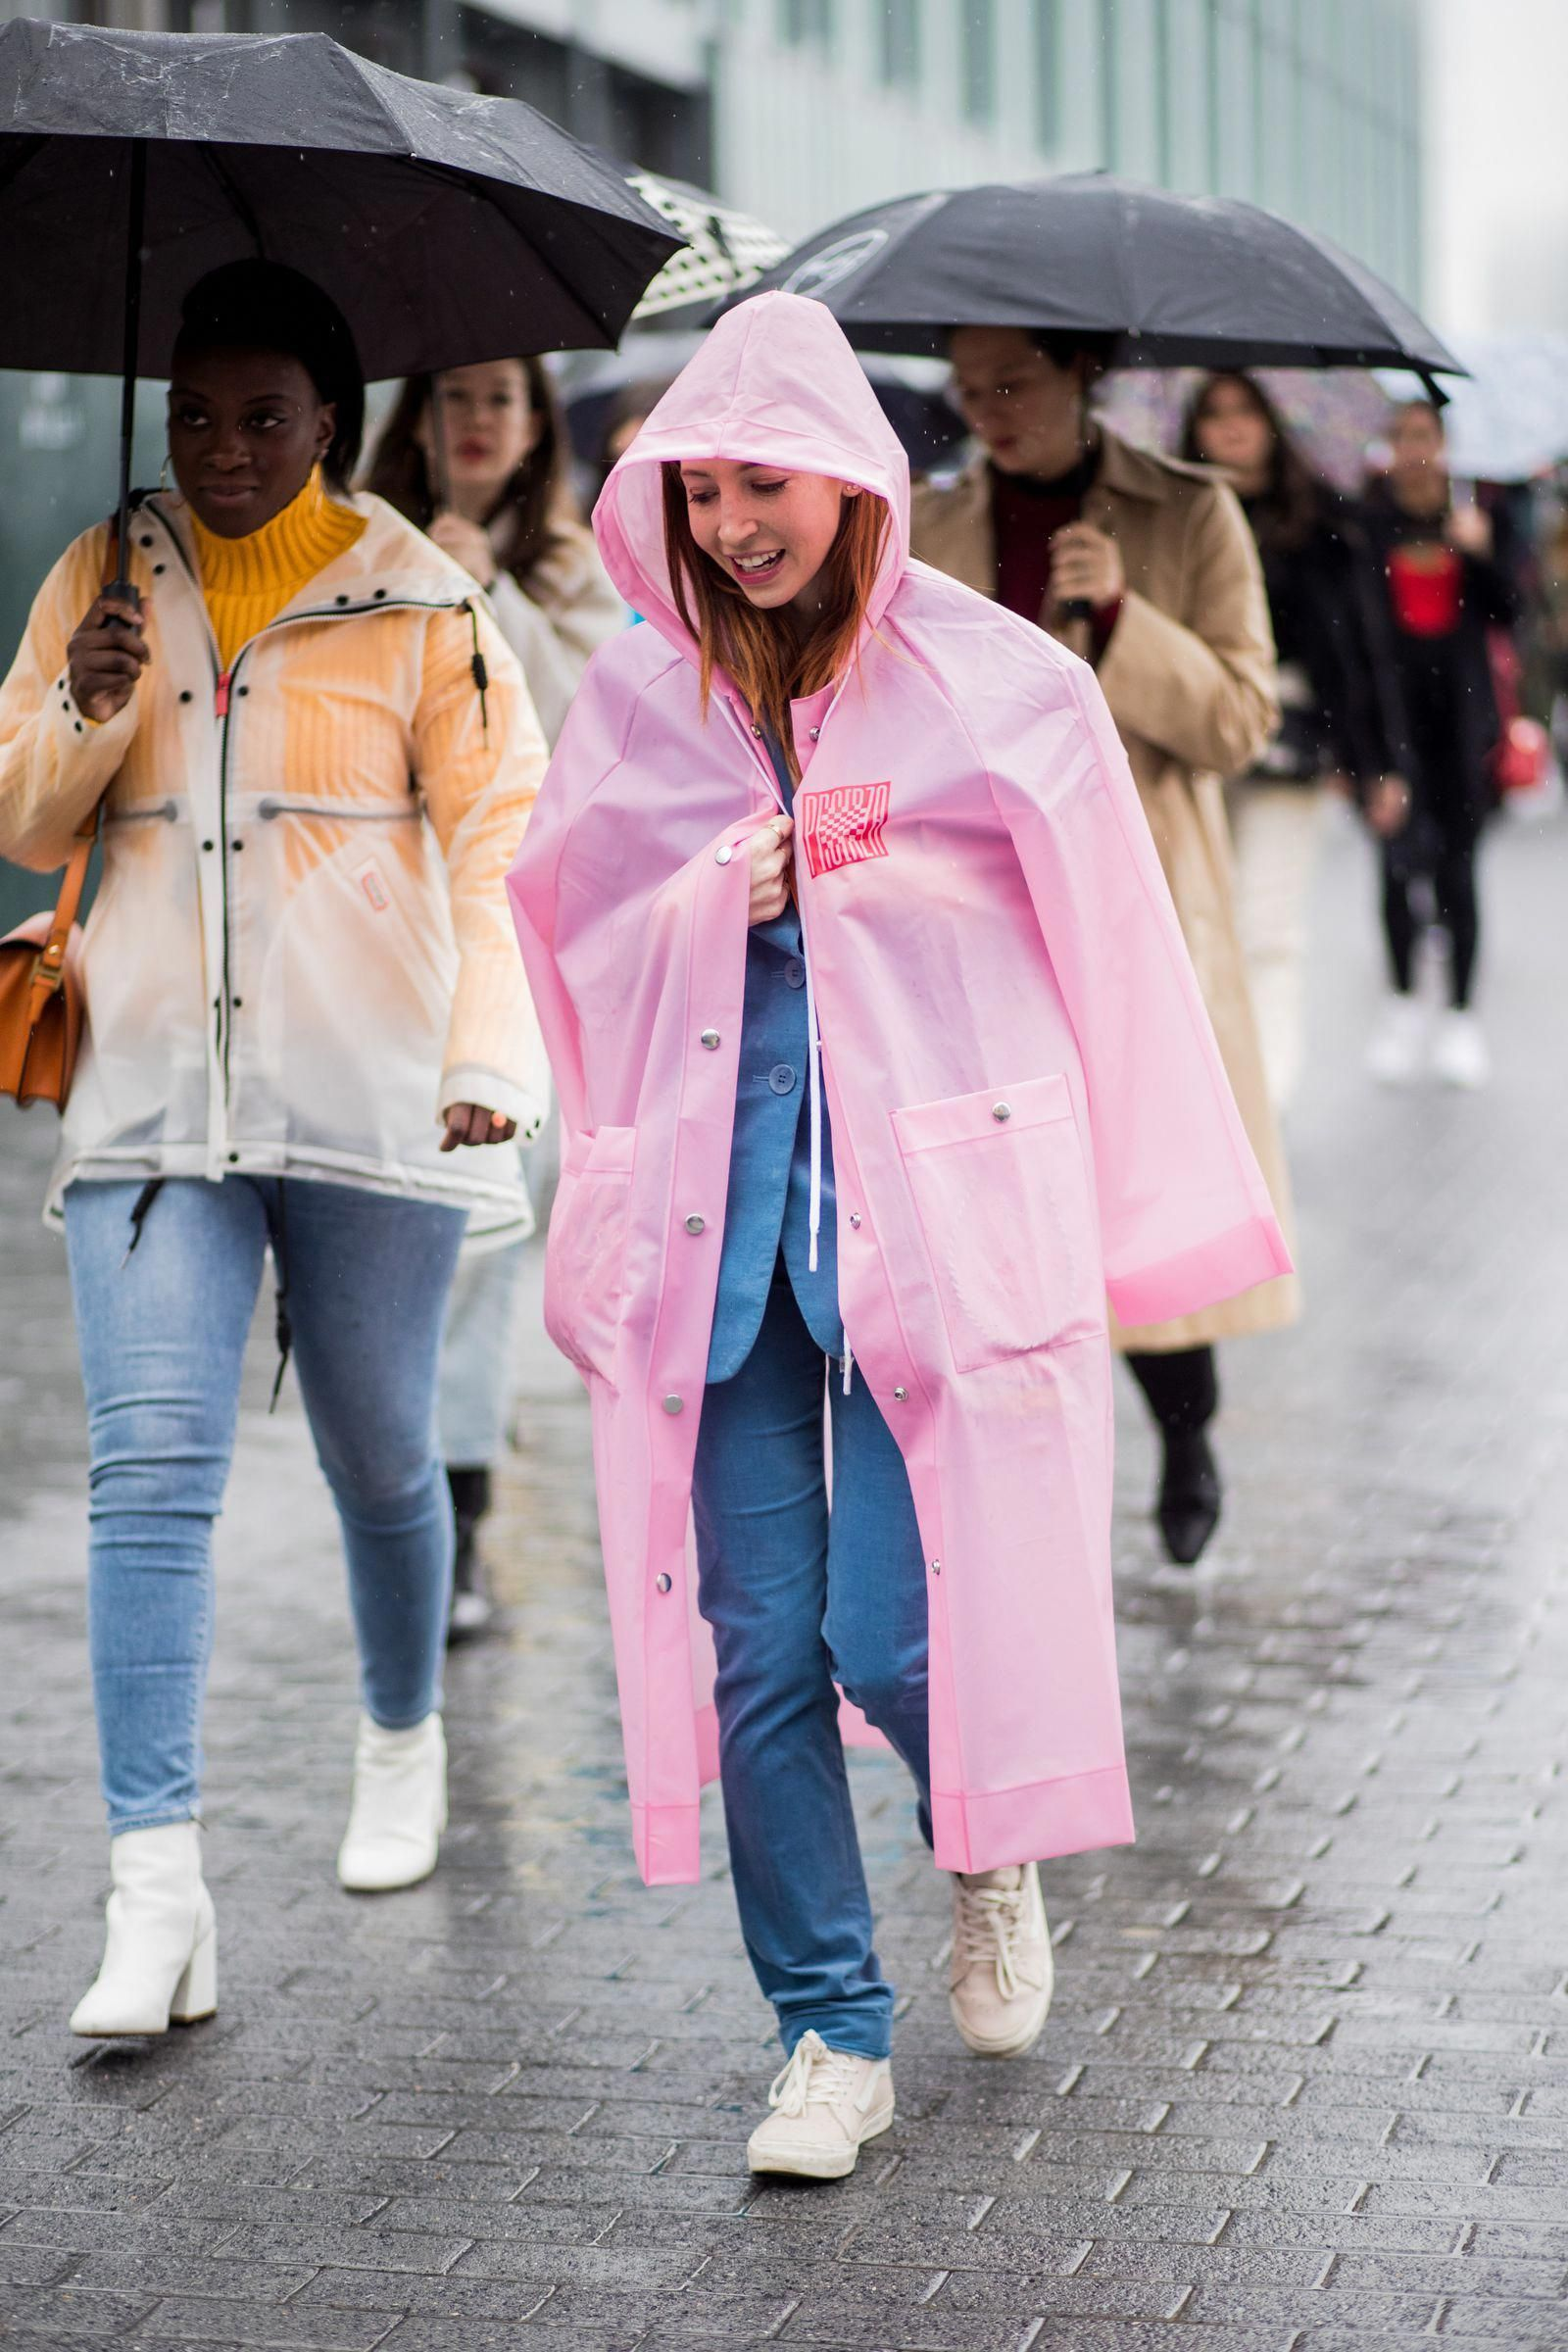 2bda6d97e013 Layer a Bright Raincoat Over a Blazer  raincoatsforwomenideas Layering  Outfits